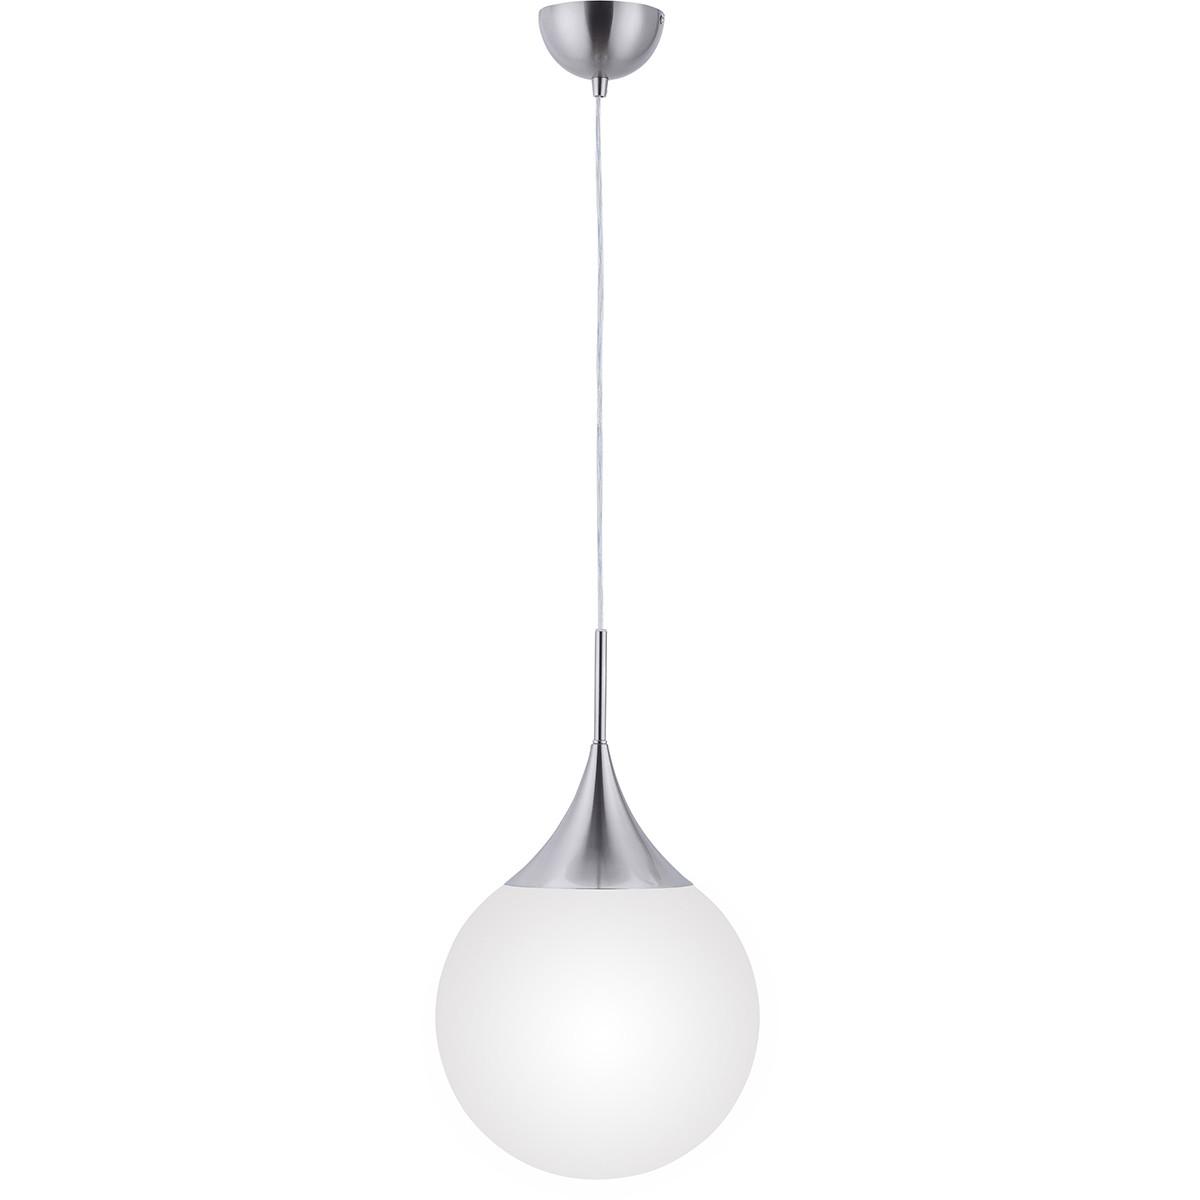 LED Hanglamp WiZ - Smart LED - Trion Dani - 11W - E27 Fitting - Aanpasbare Kleur - Dimbaar - Rond -